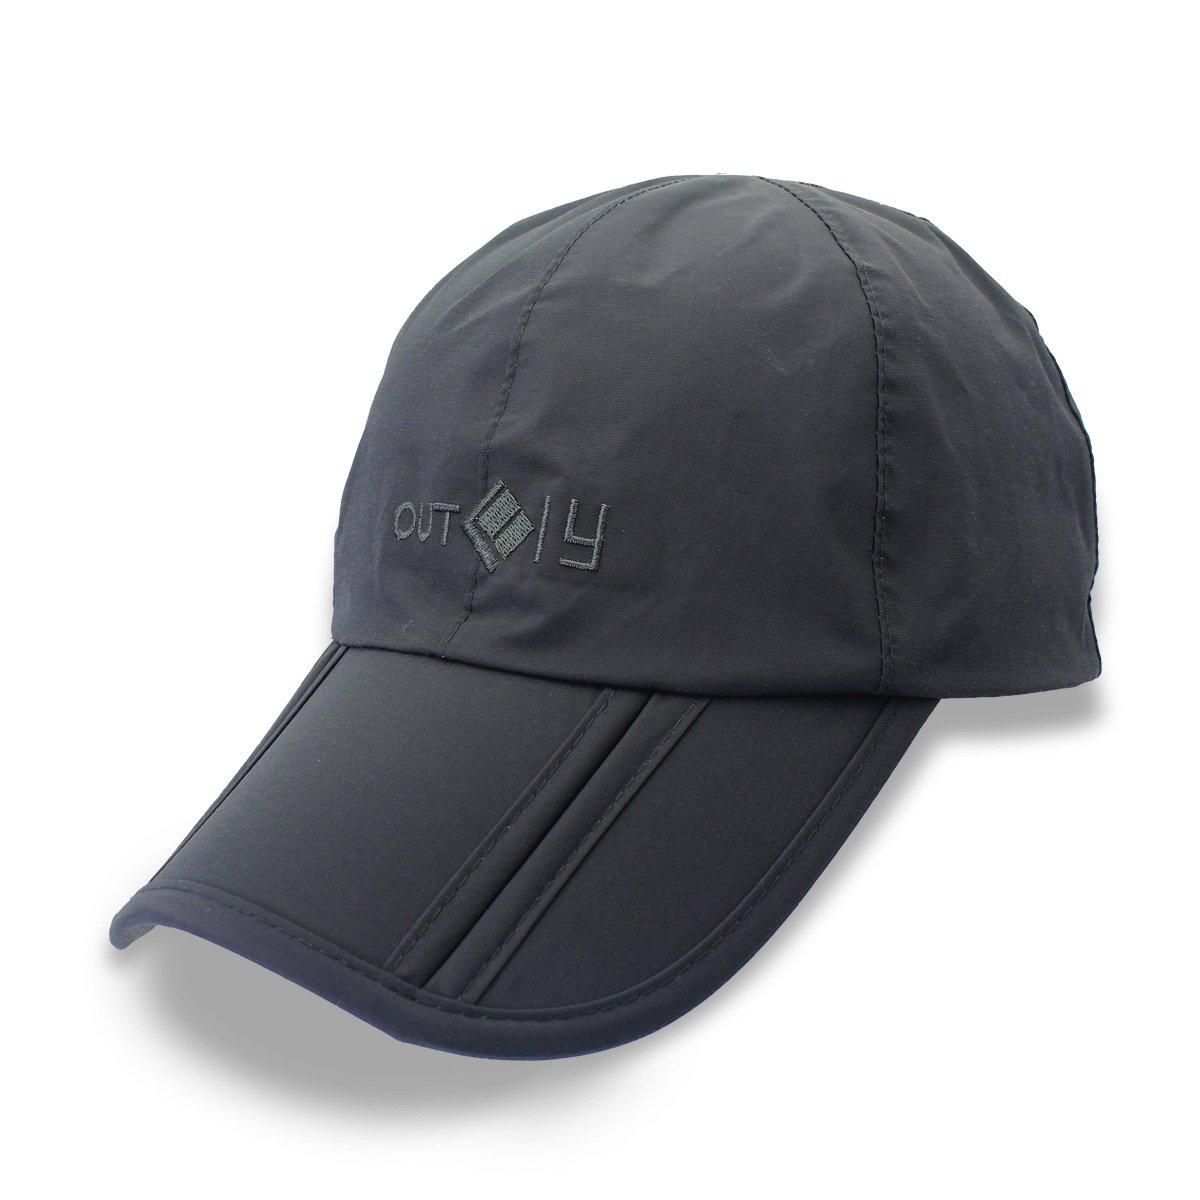 Outfly Gorra de béisbol impermeable 9fbd3285256